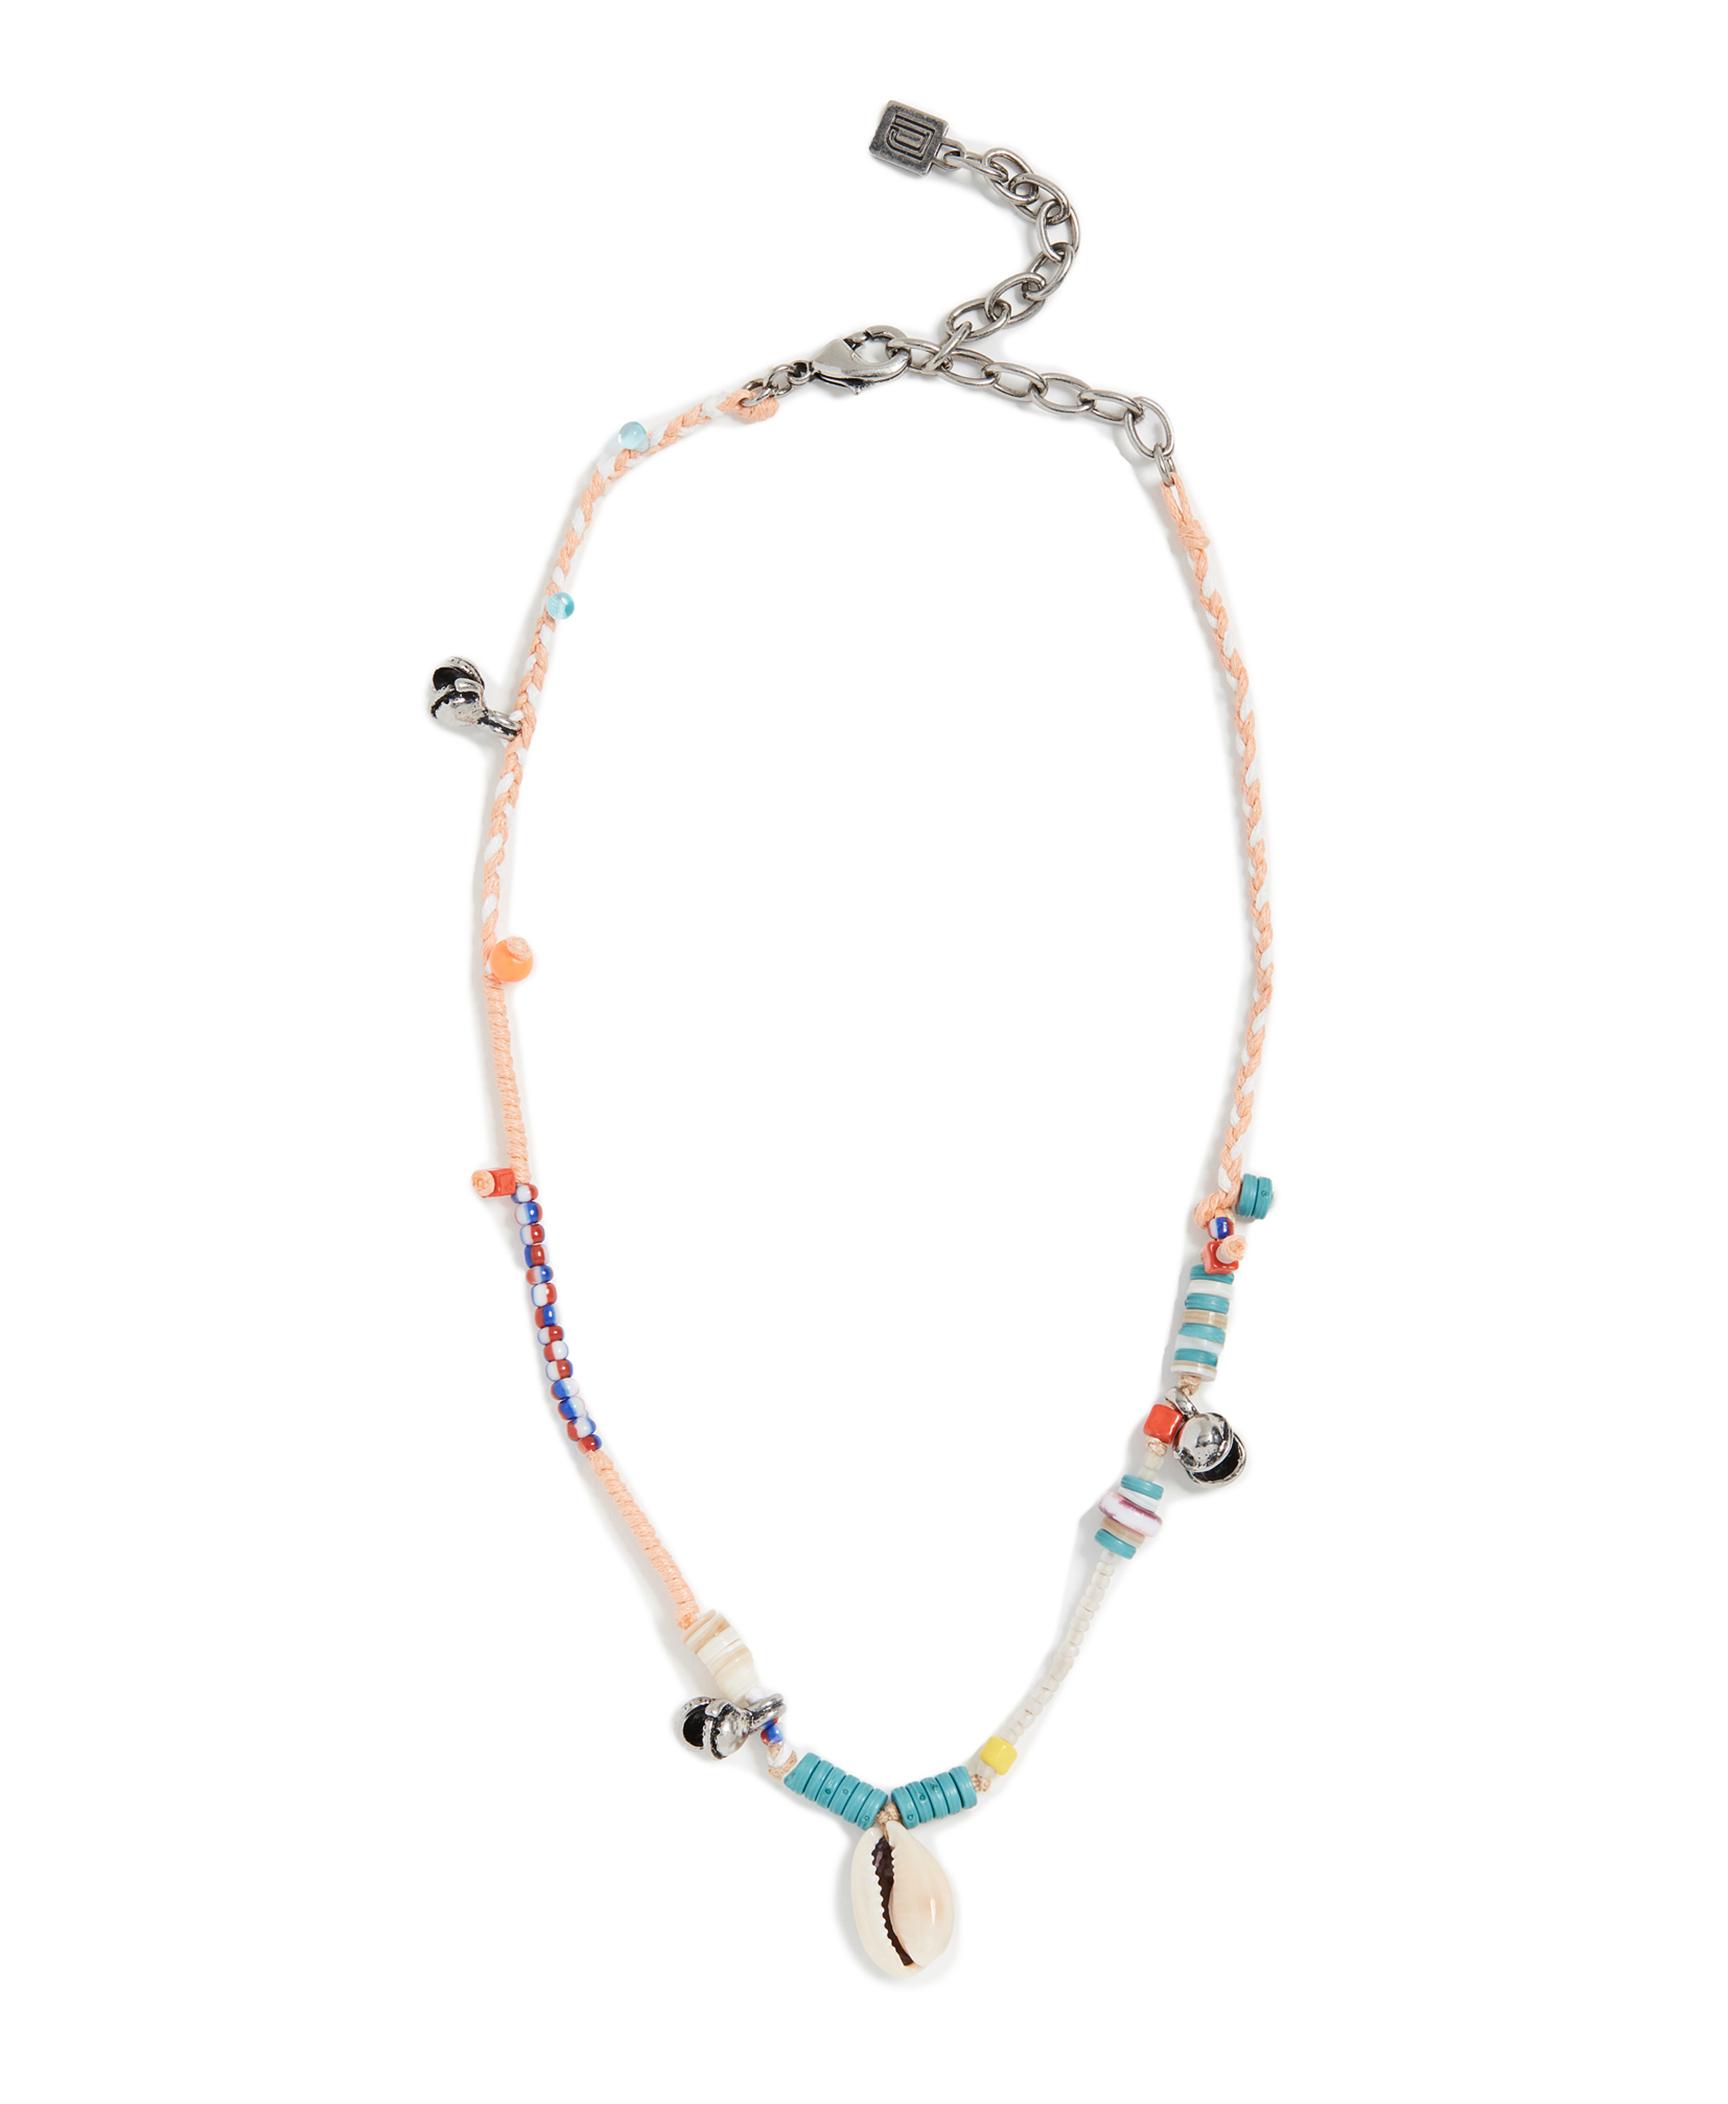 Maldives Shell Necklace